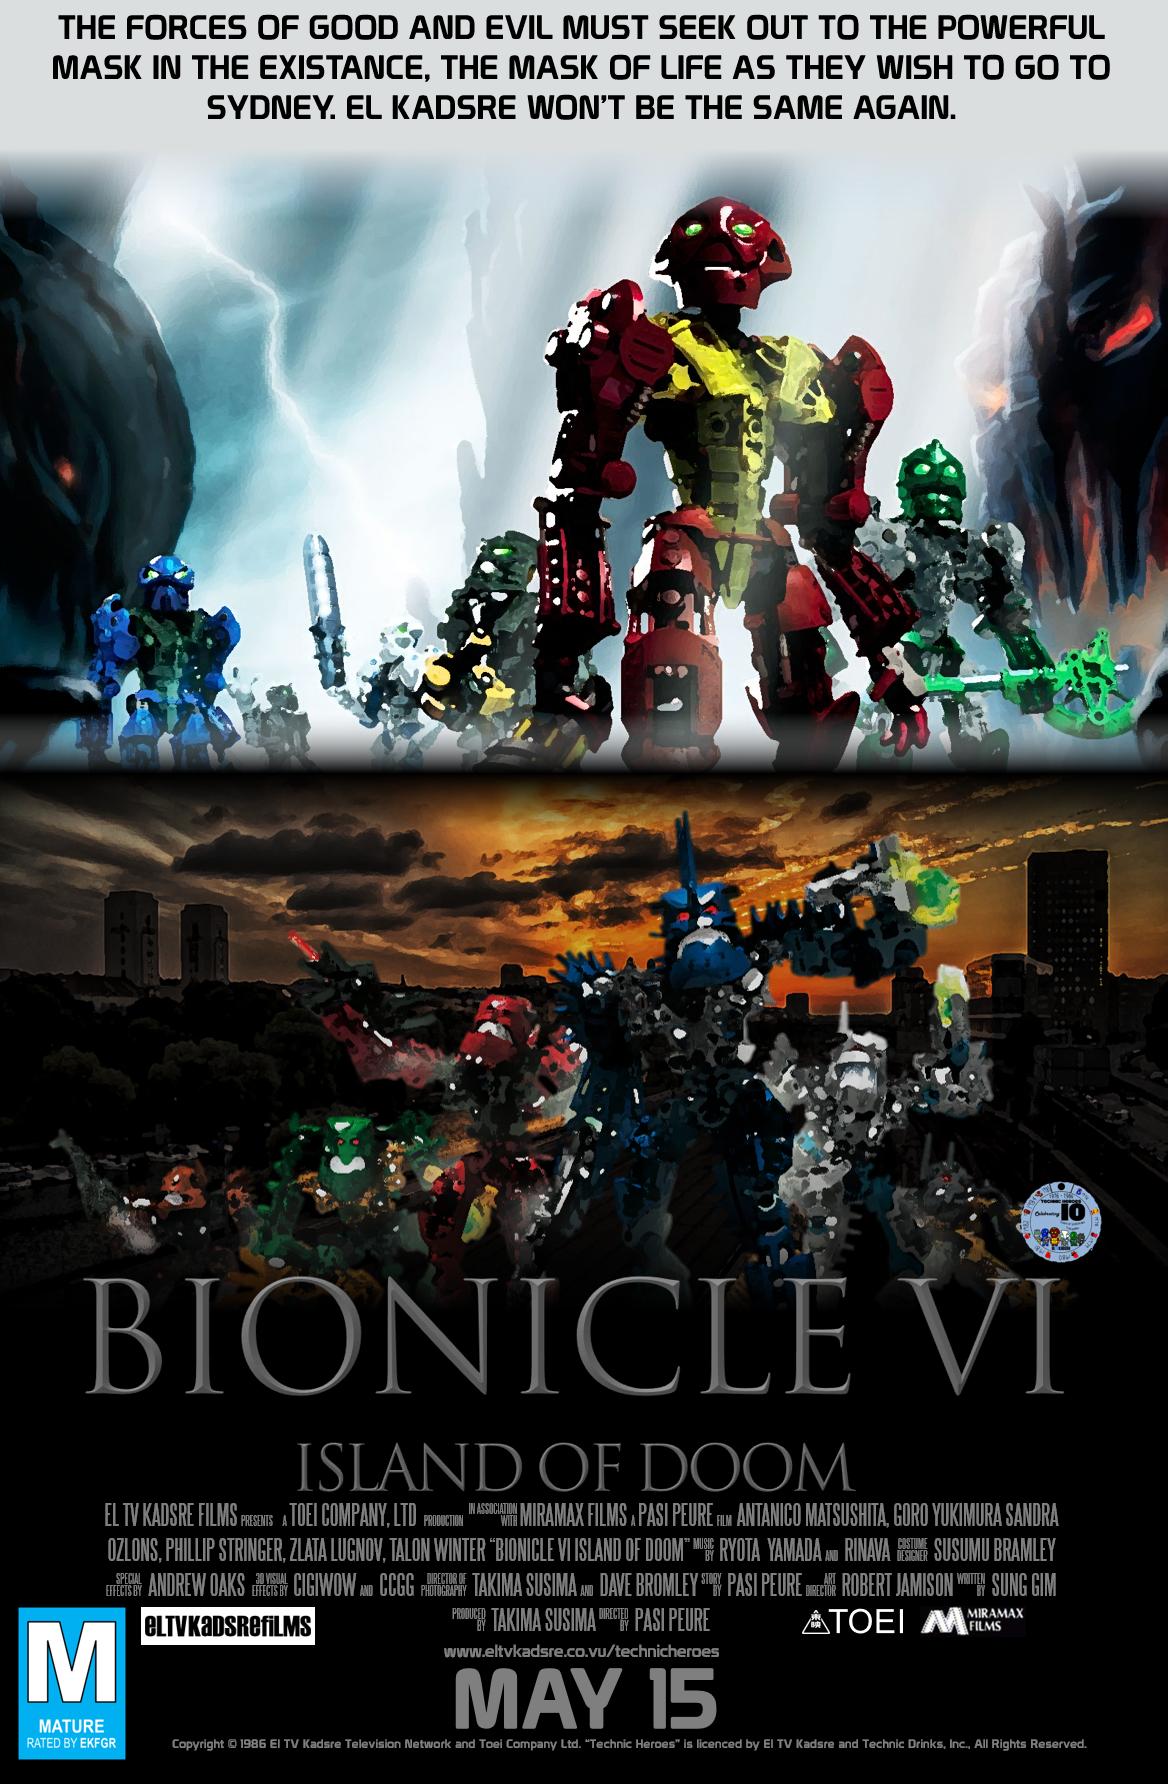 Bionicle VI: Island of Doom